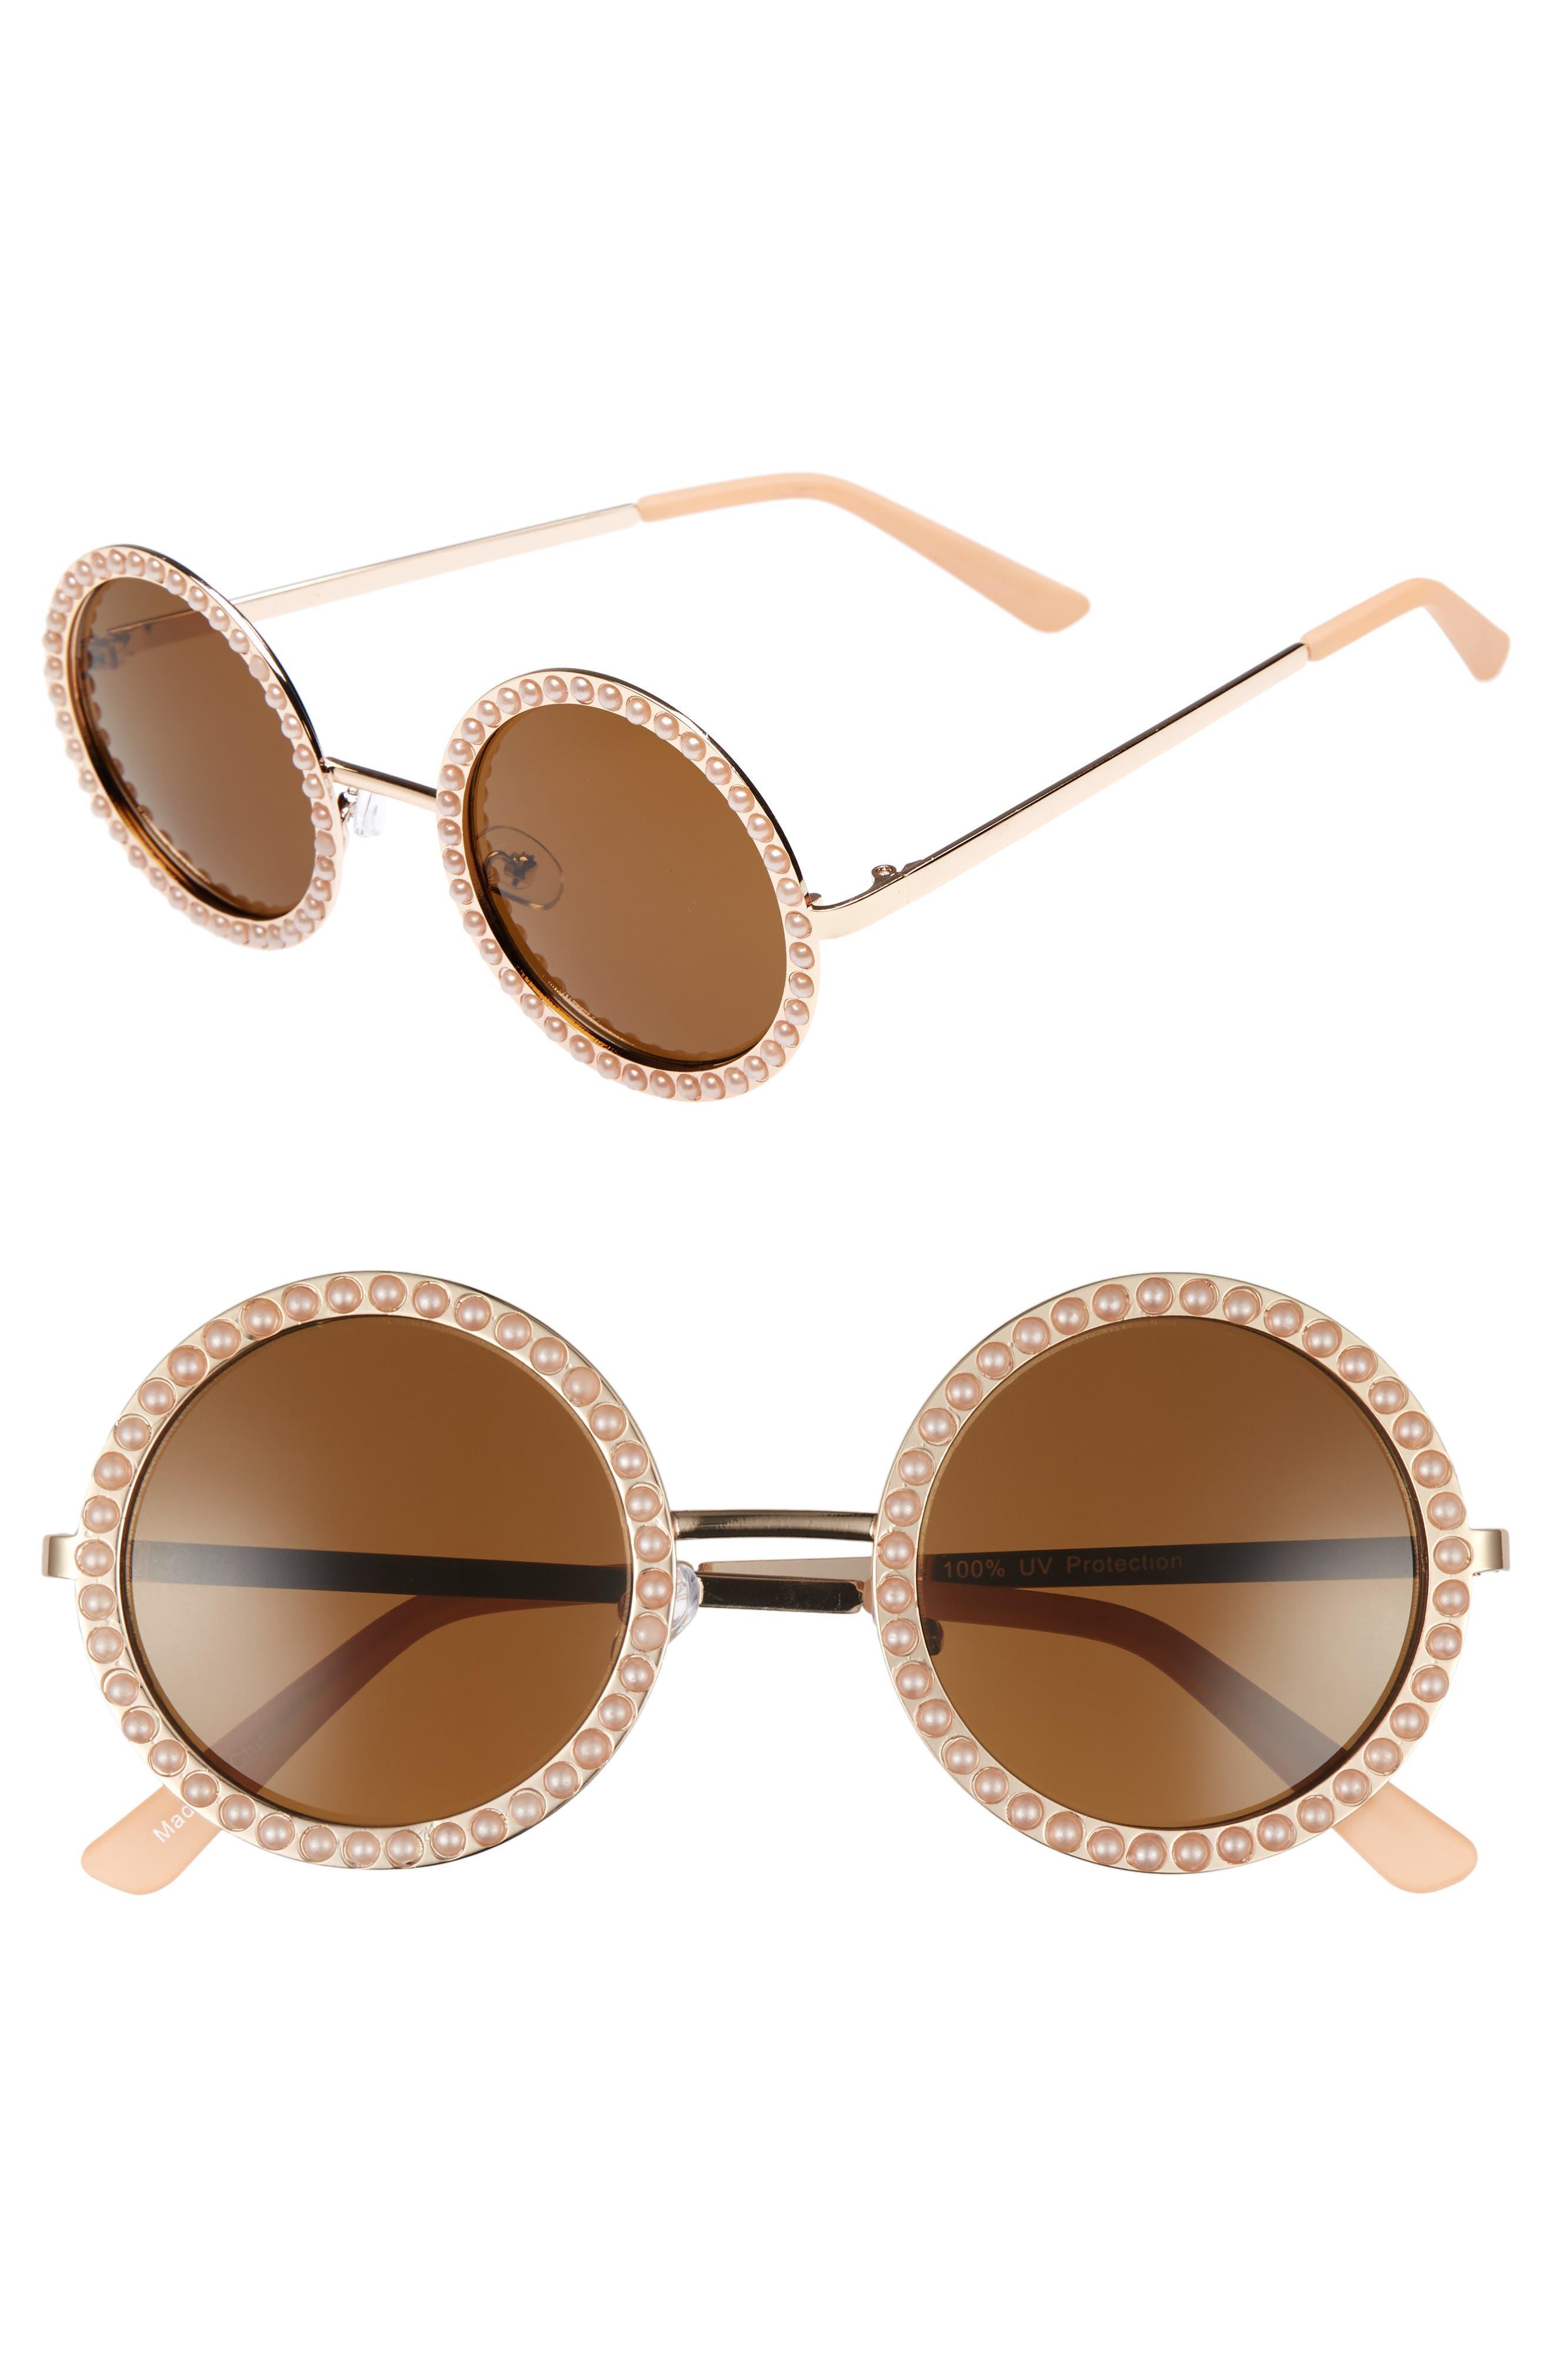 55mm Imitation Pearl Round Sunglasses,                             Main thumbnail 1, color,                             710